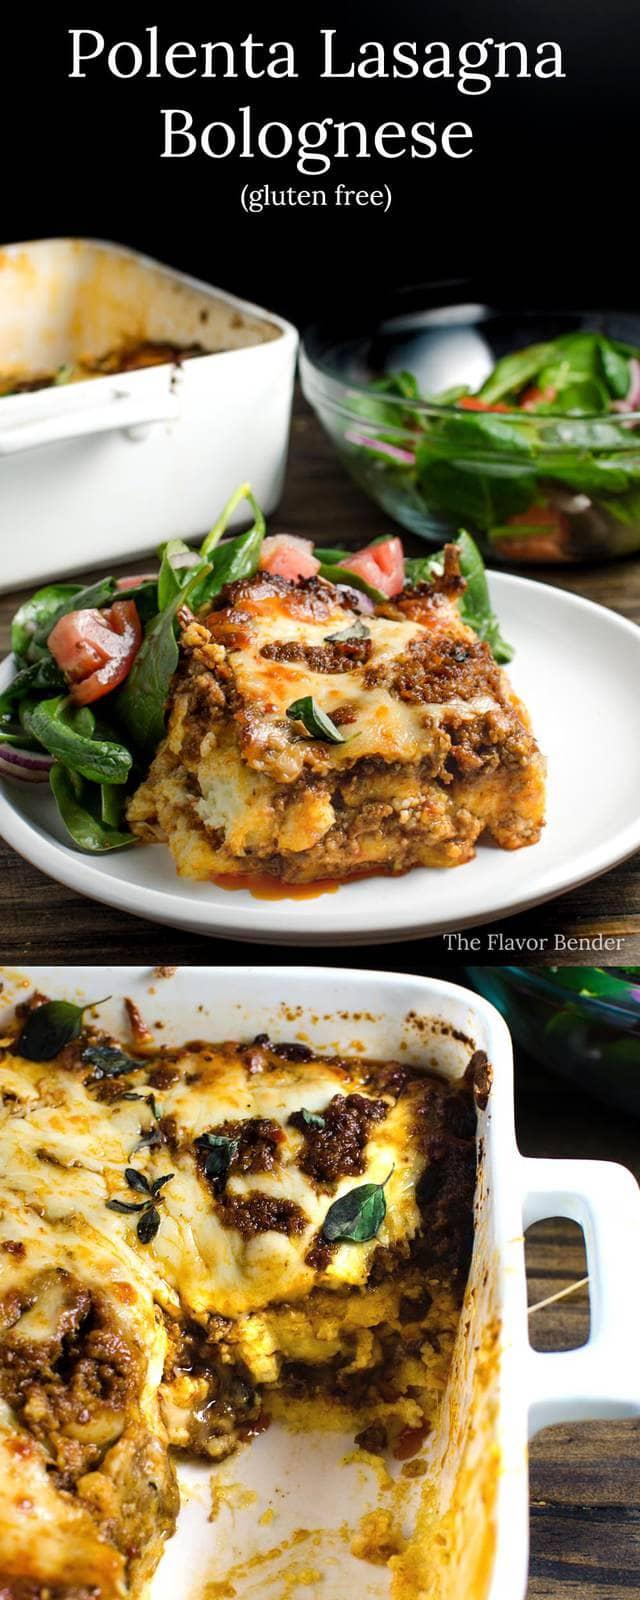 Polenta Lasagna Bolognese - This gluten free, delicious family recipe ...